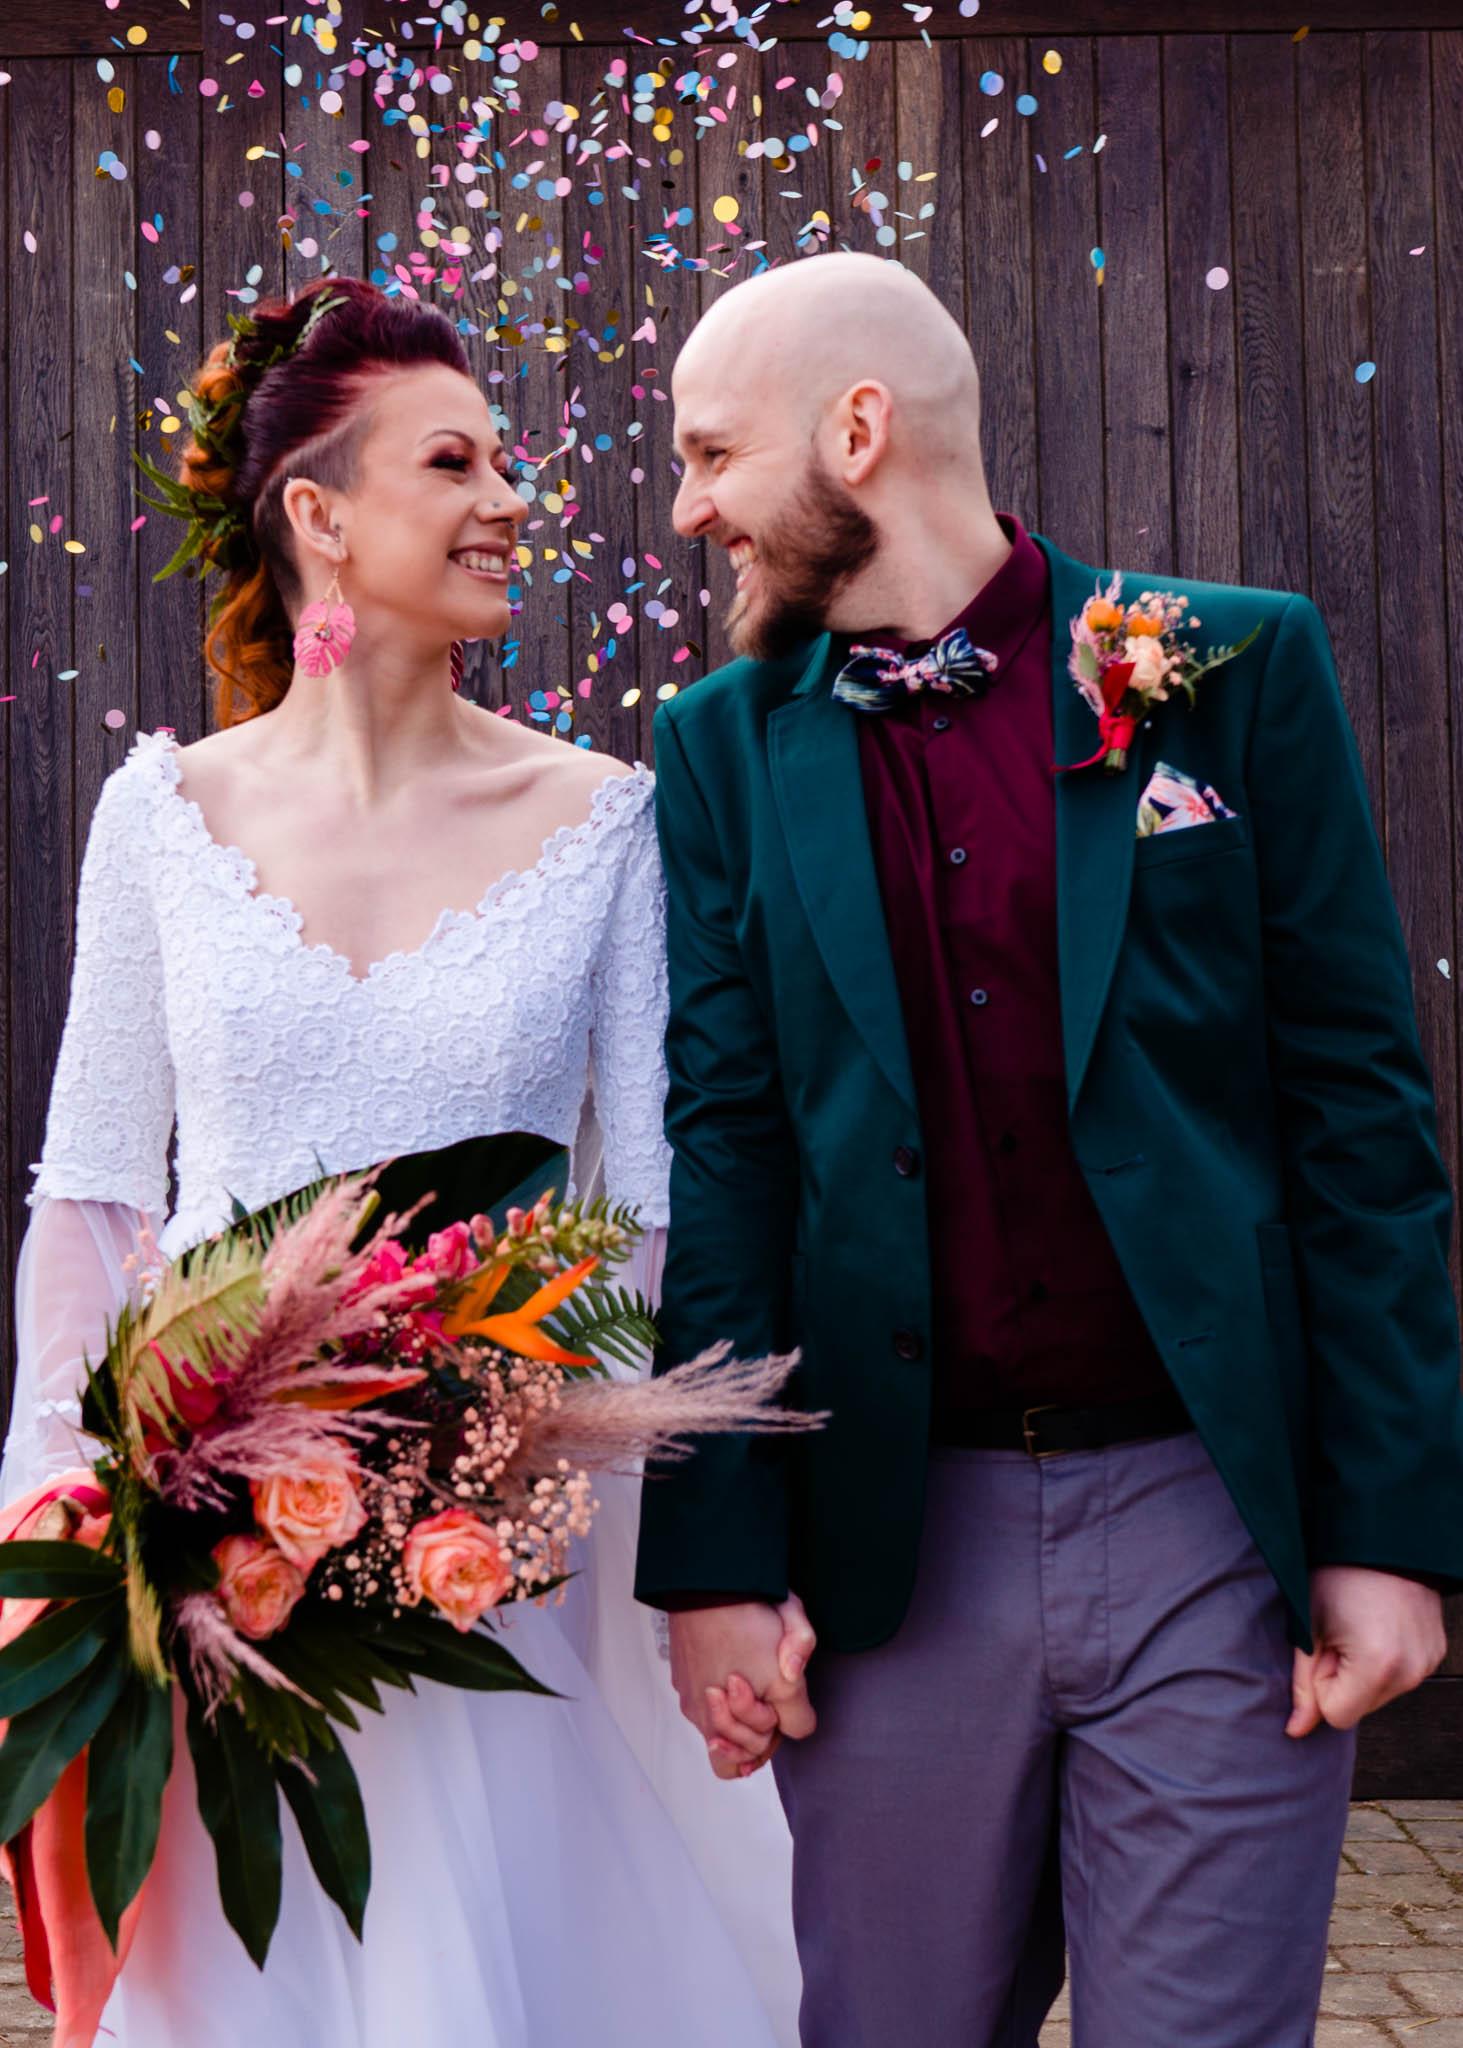 wedding confetti photo - modern wedding photos - colourful wedding - modern tropical wedding - modern wedding - modern bride - east midlands wedding planner